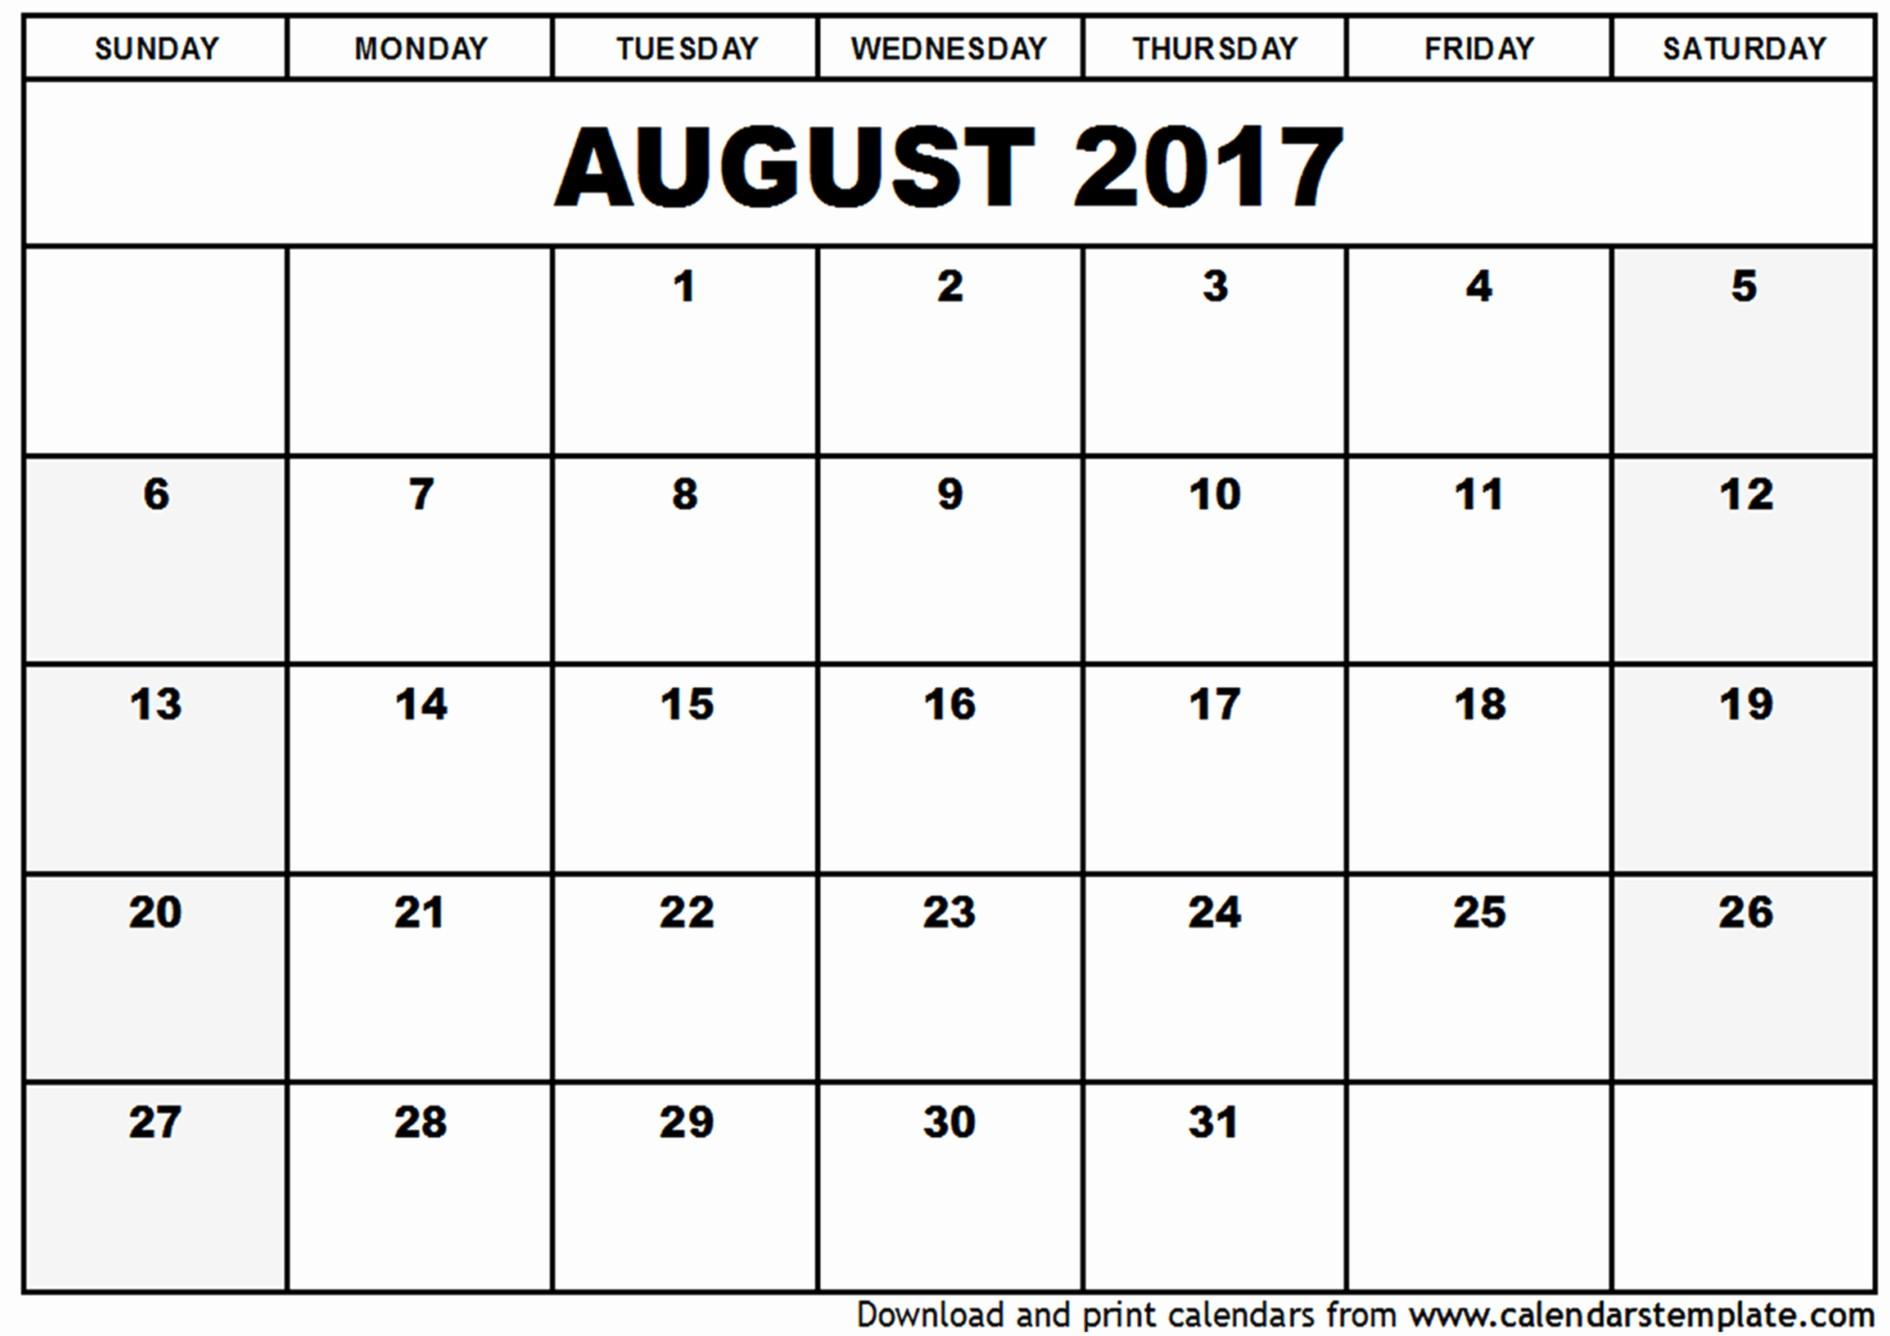 Blank May Calendar 2017 Printable Unique Blank August 2017 Calendar